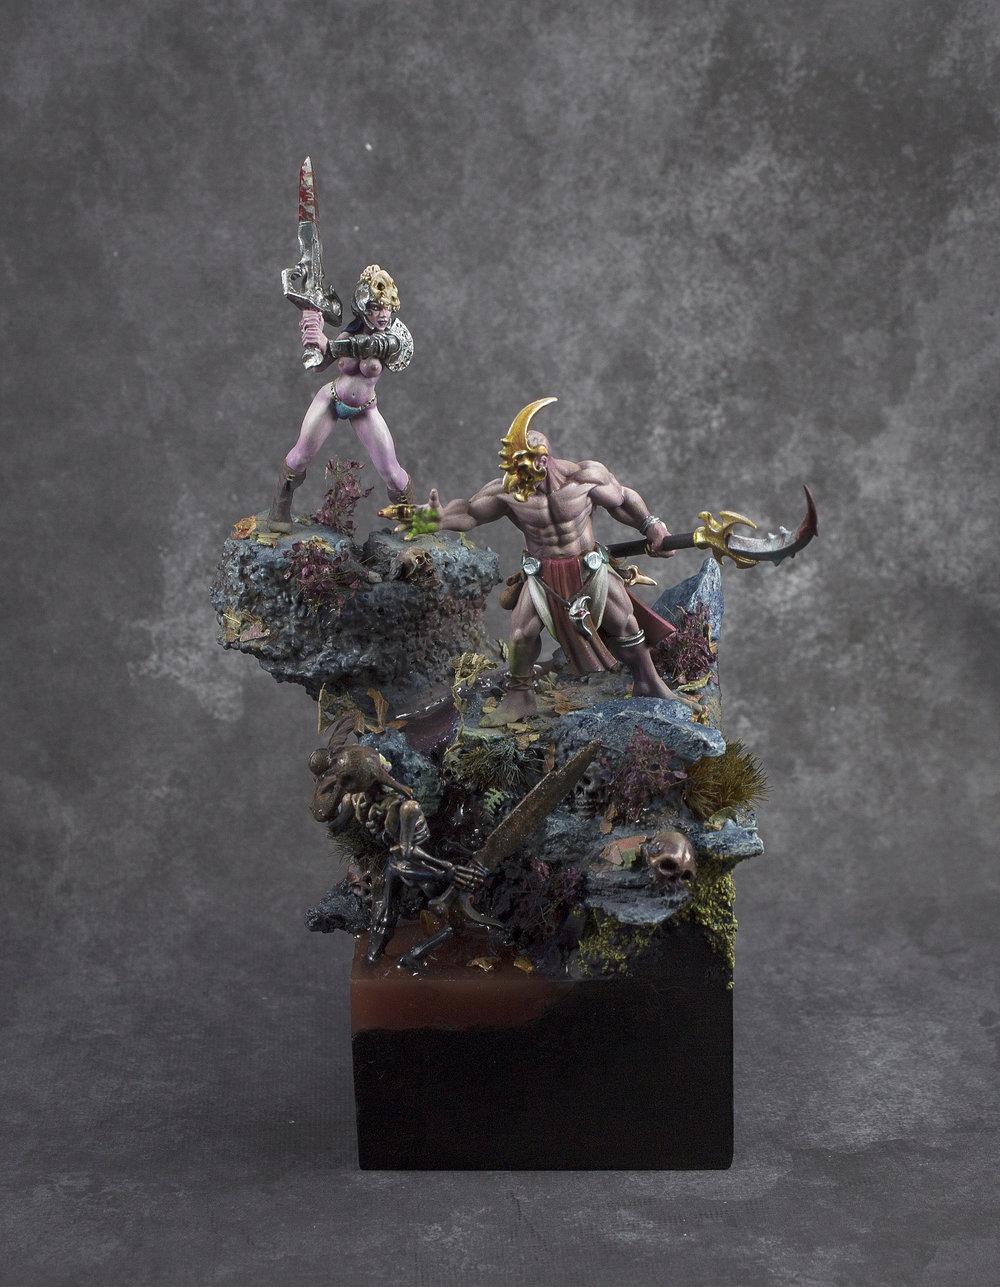 Sorceress vs Acolyte